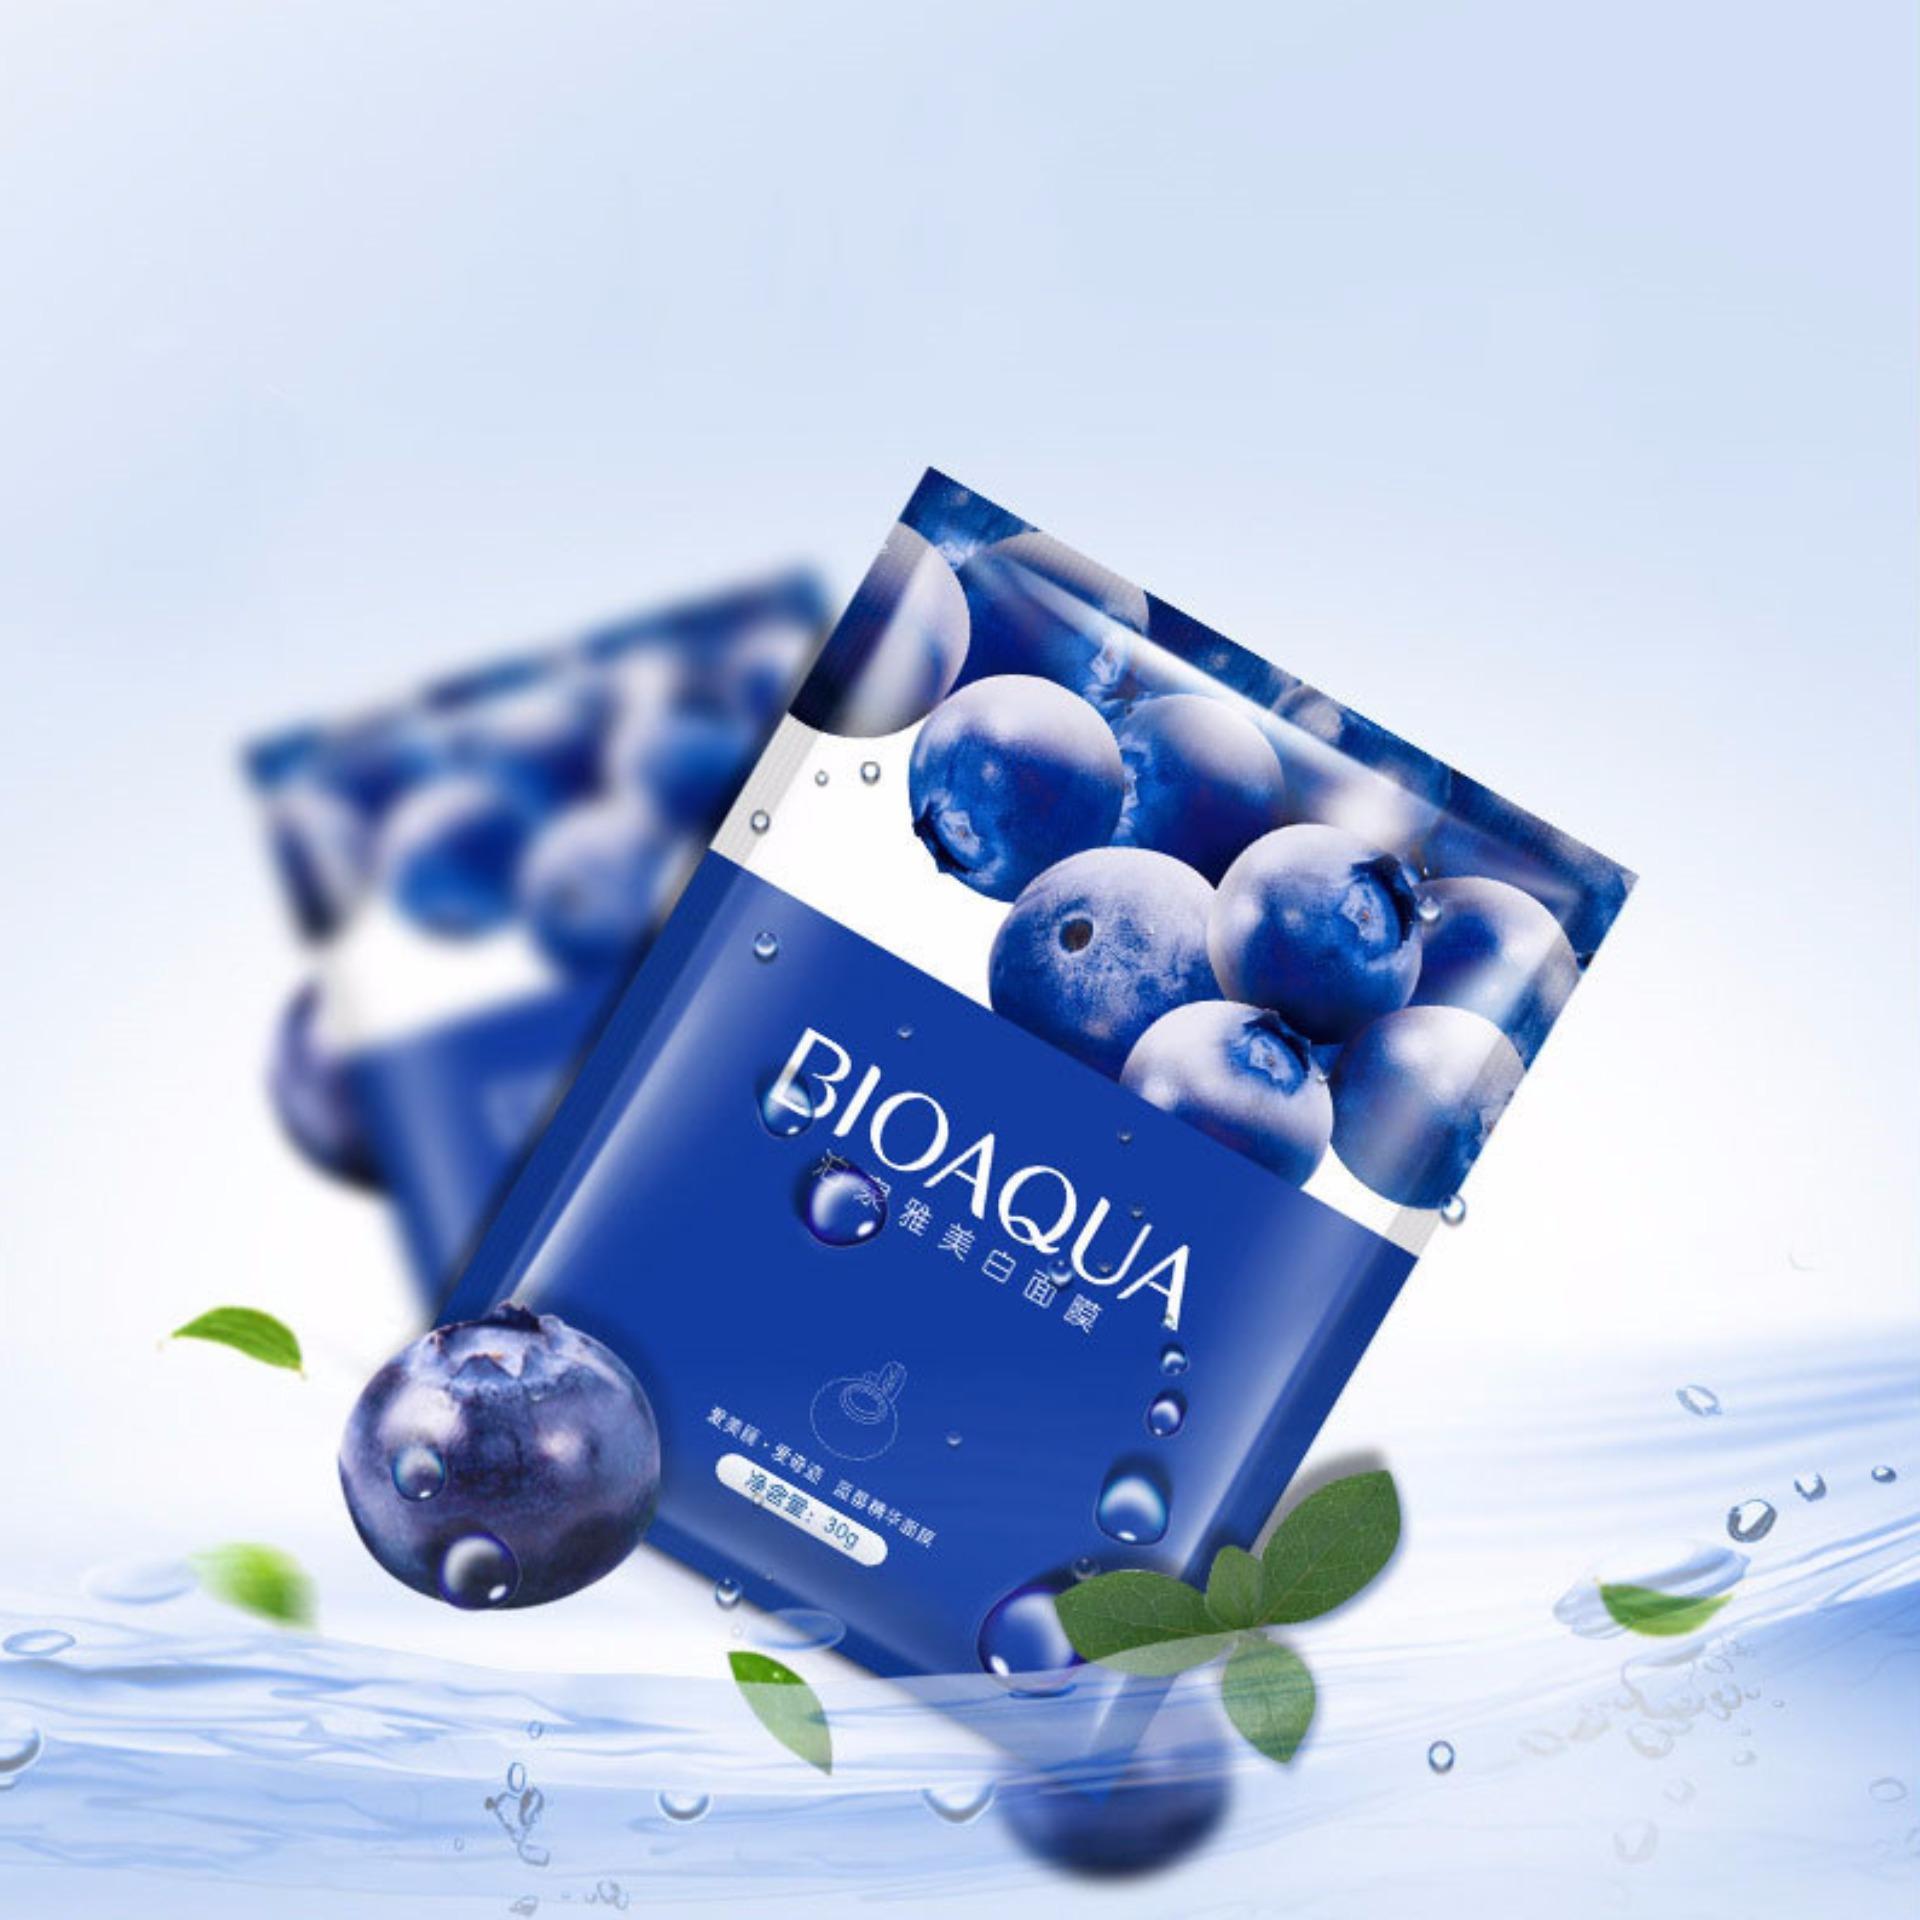 Bioaqua Fountain Spray 150ml Blueberry Penyegar Wajah2 Lihat Masker Tirus Wajah V Shaped Penirus